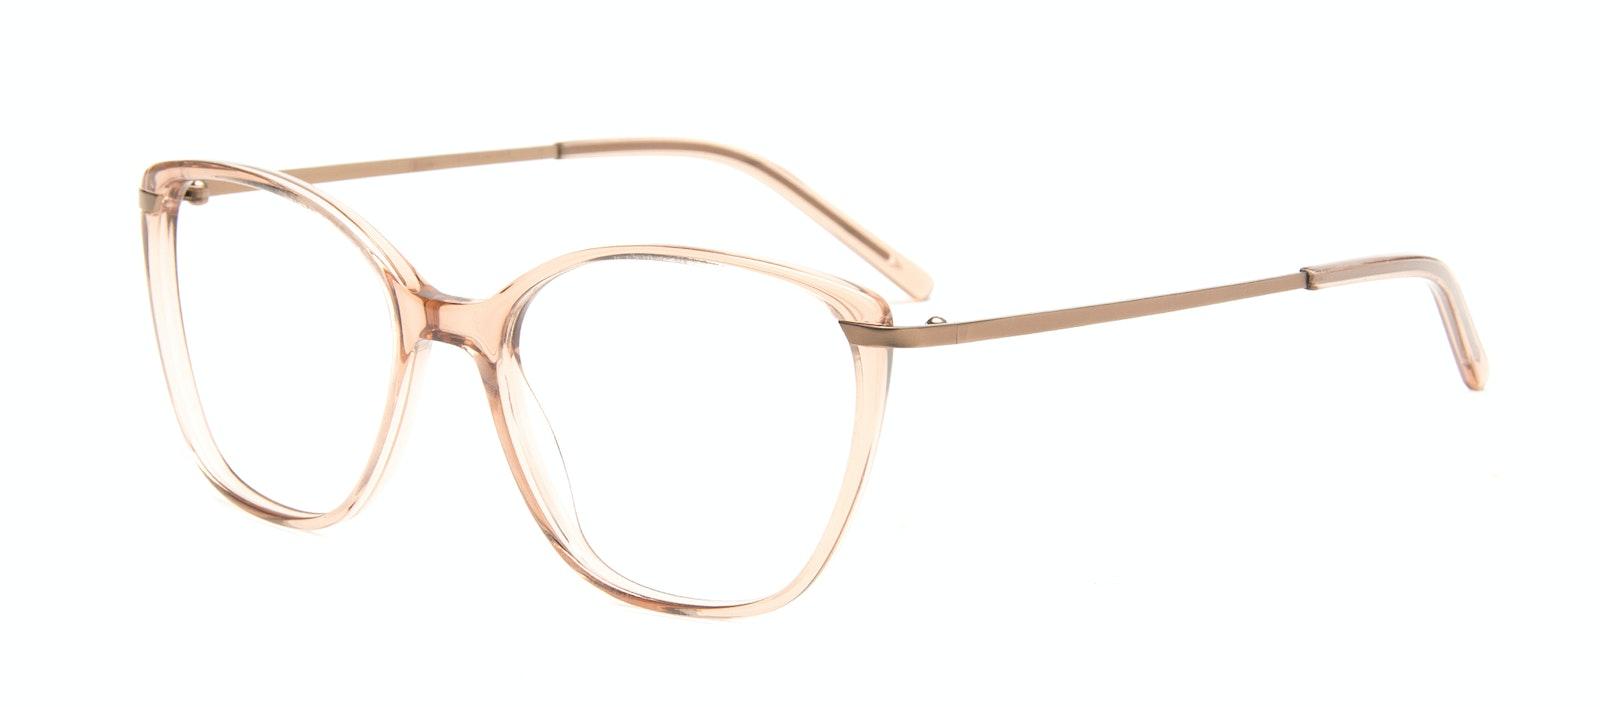 Affordable Fashion Glasses Rectangle Square Eyeglasses Women Illusion Rose Tilt